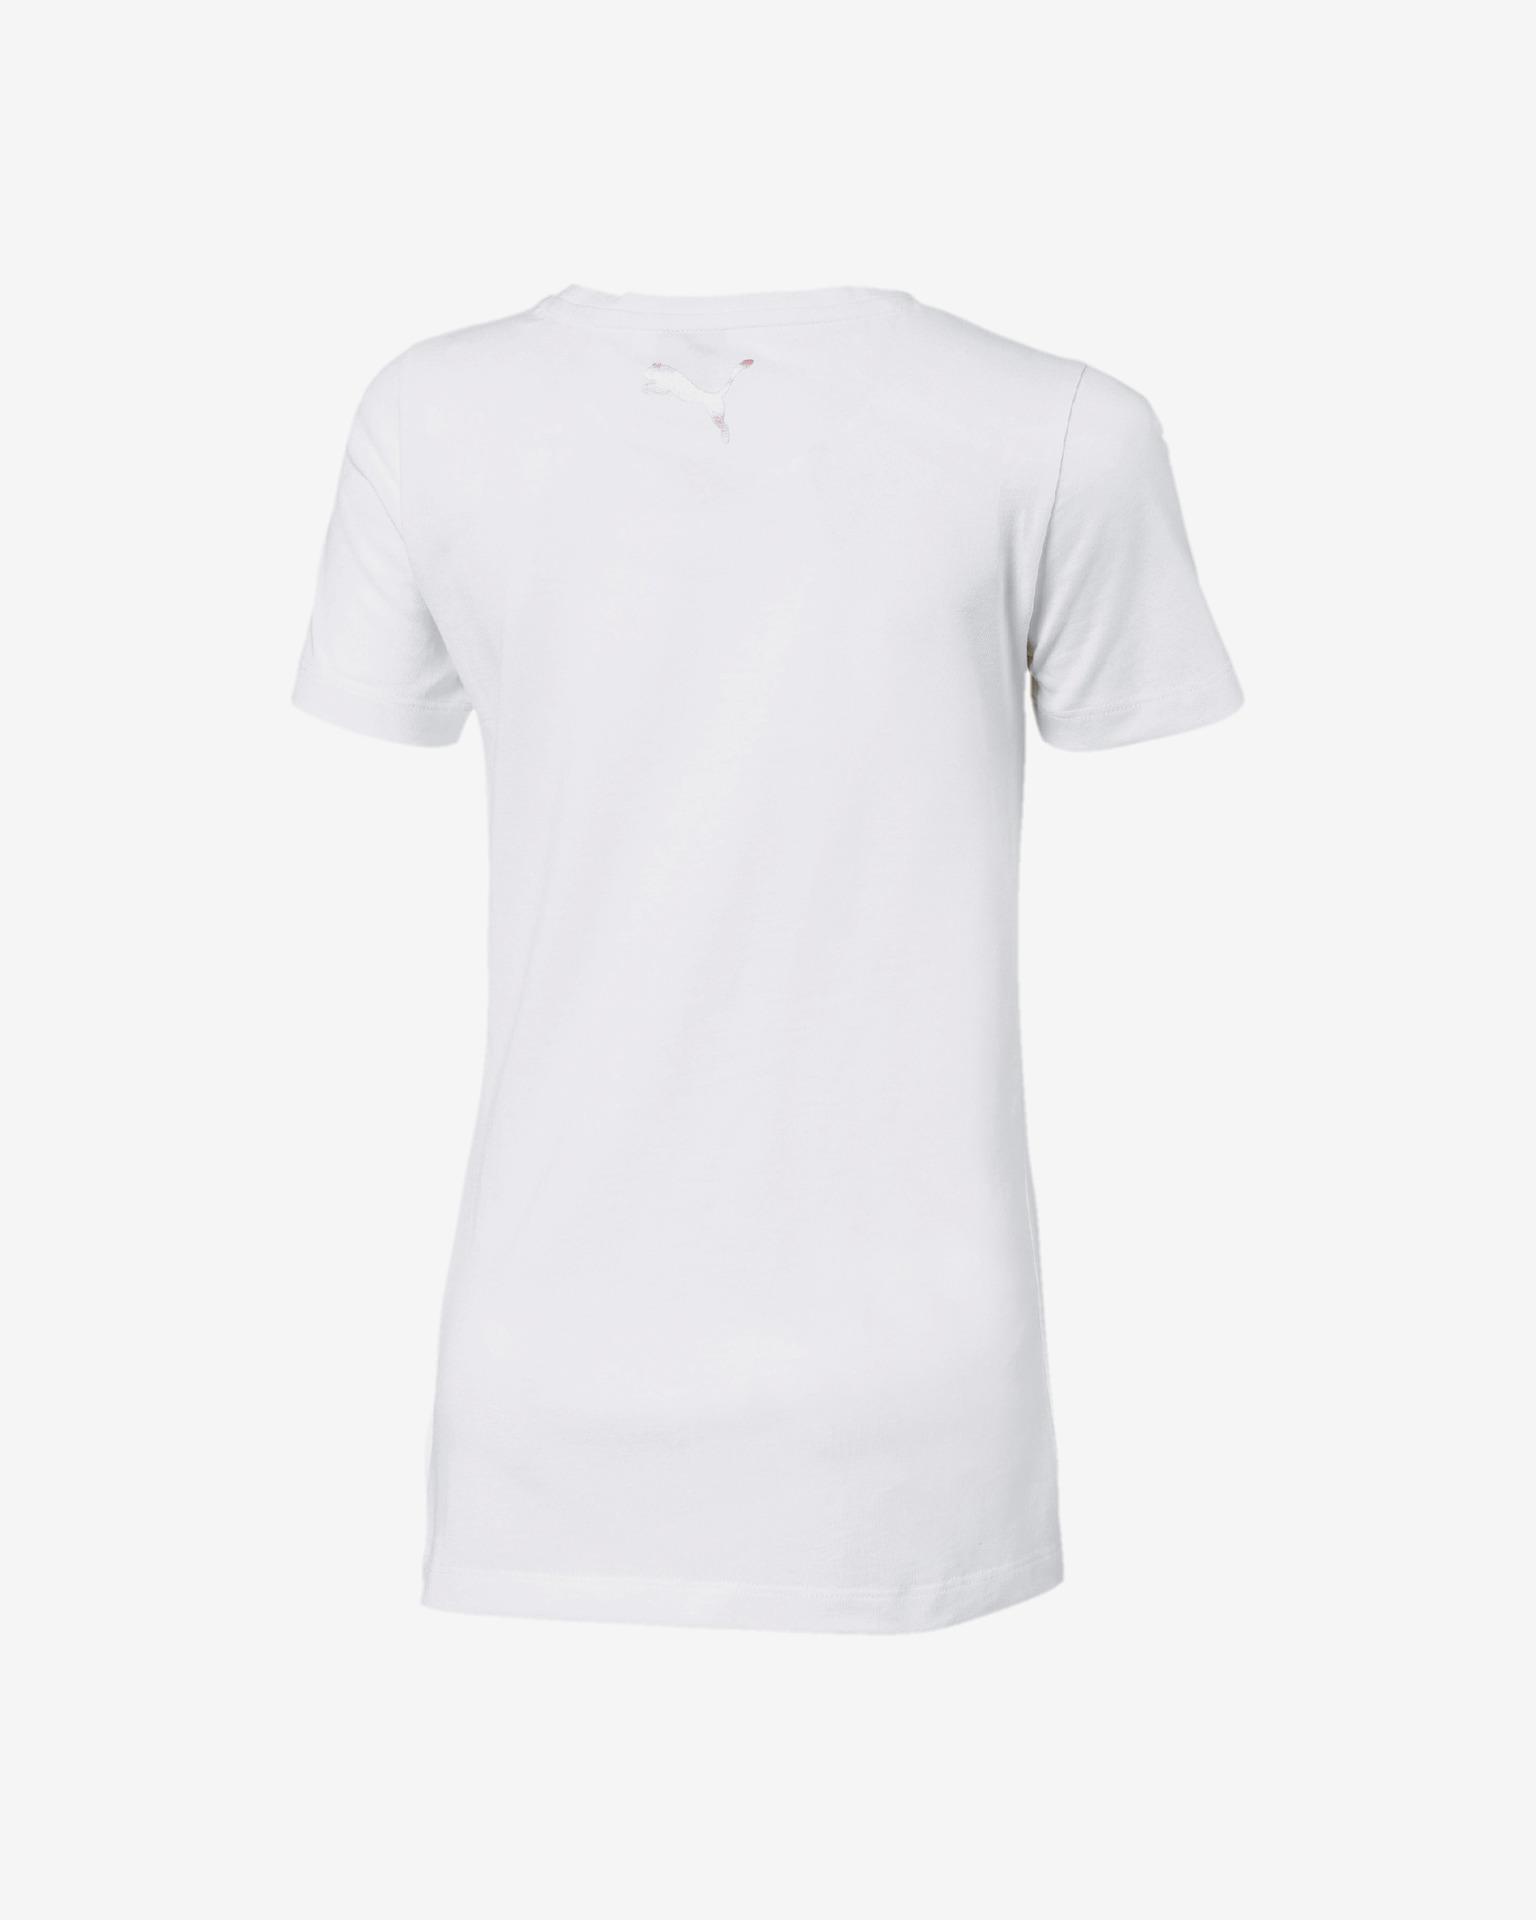 Puma Boys t-shirt white